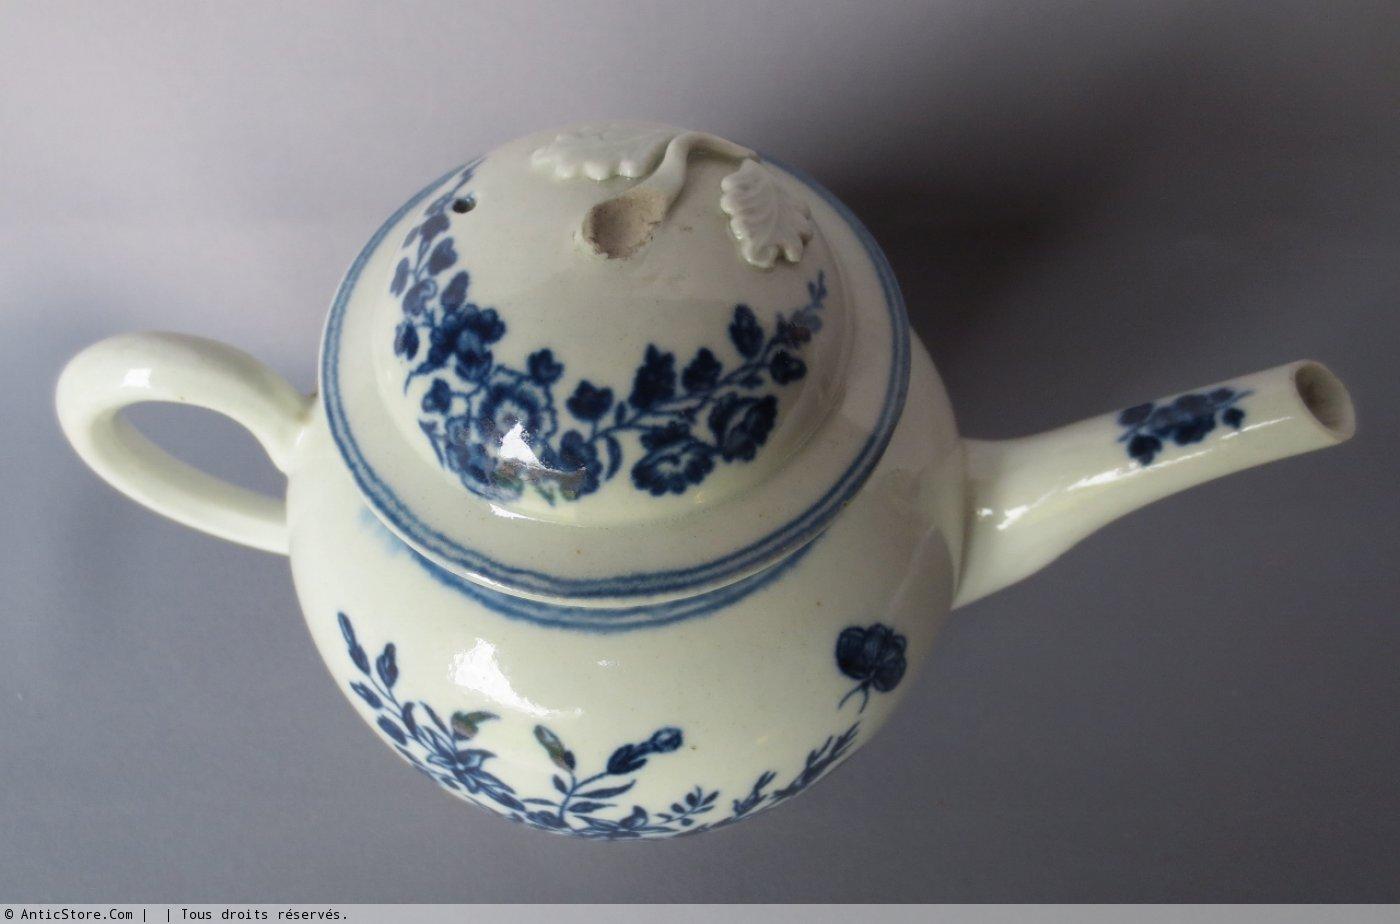 Caughley Porcelain Xviiith Century Ref 15259